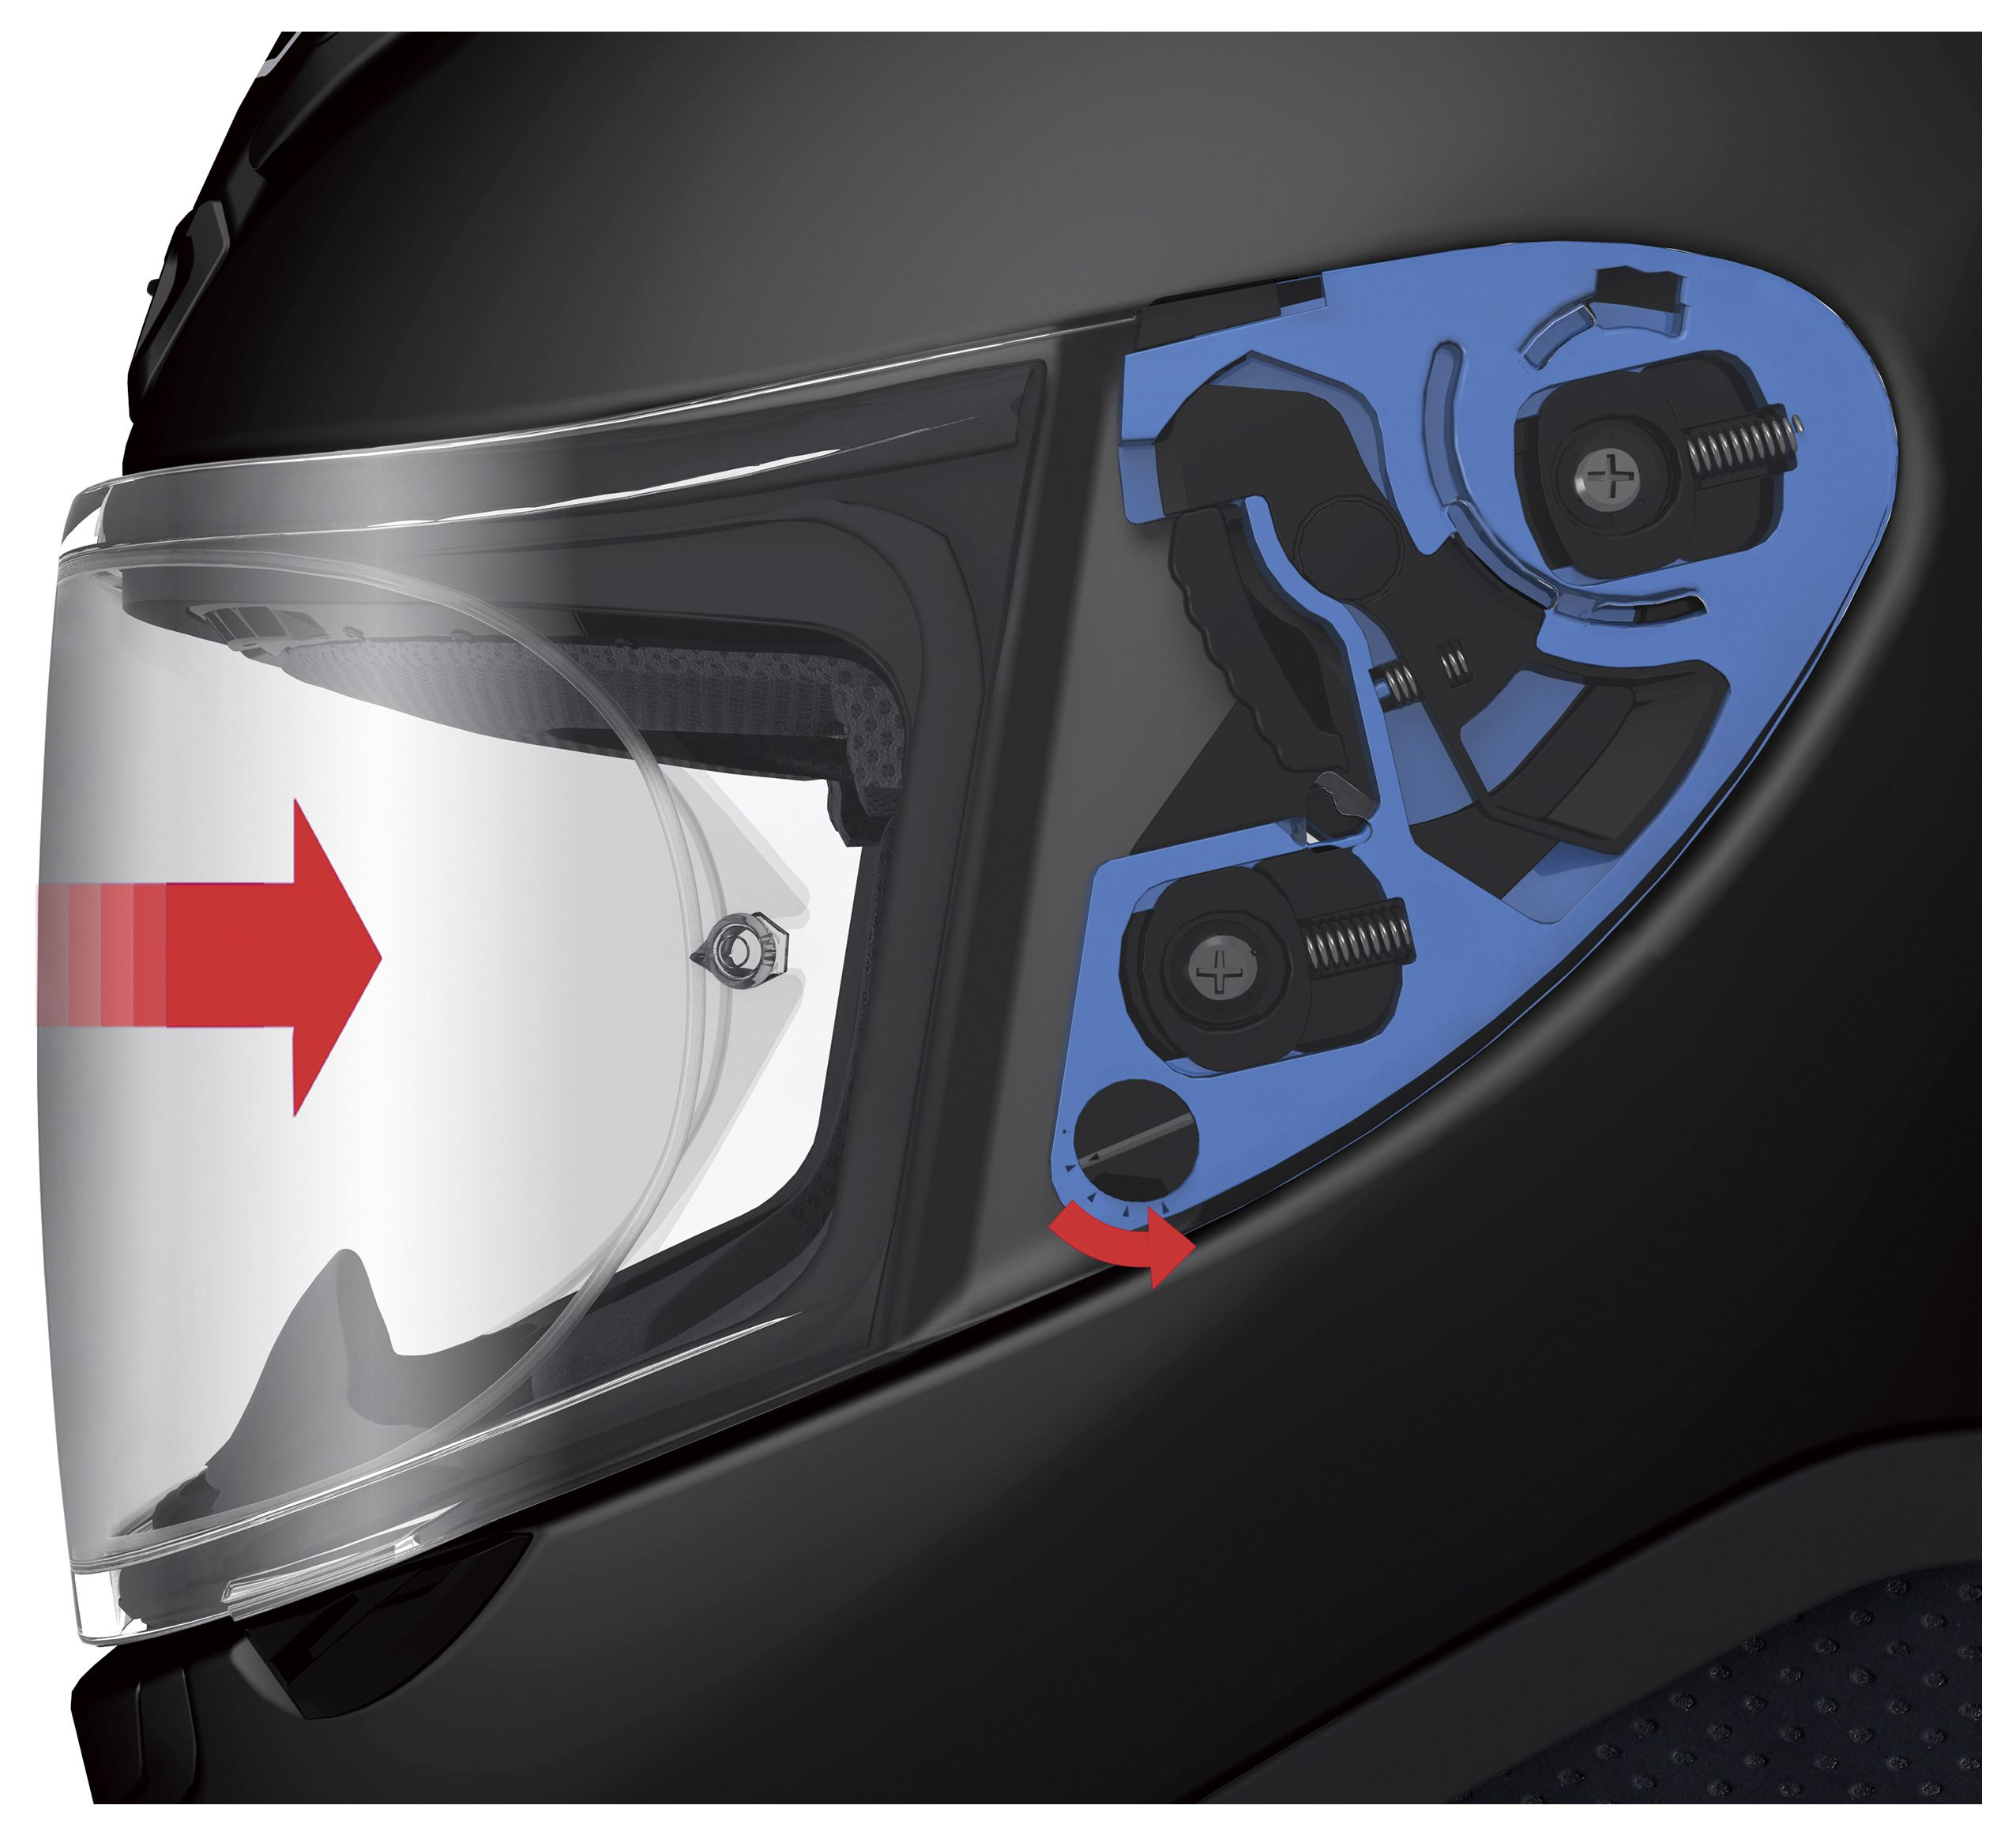 Shoei Rf 1200 Helmet Solid Revzilla Ink Cl Max Visor Dark Smoke